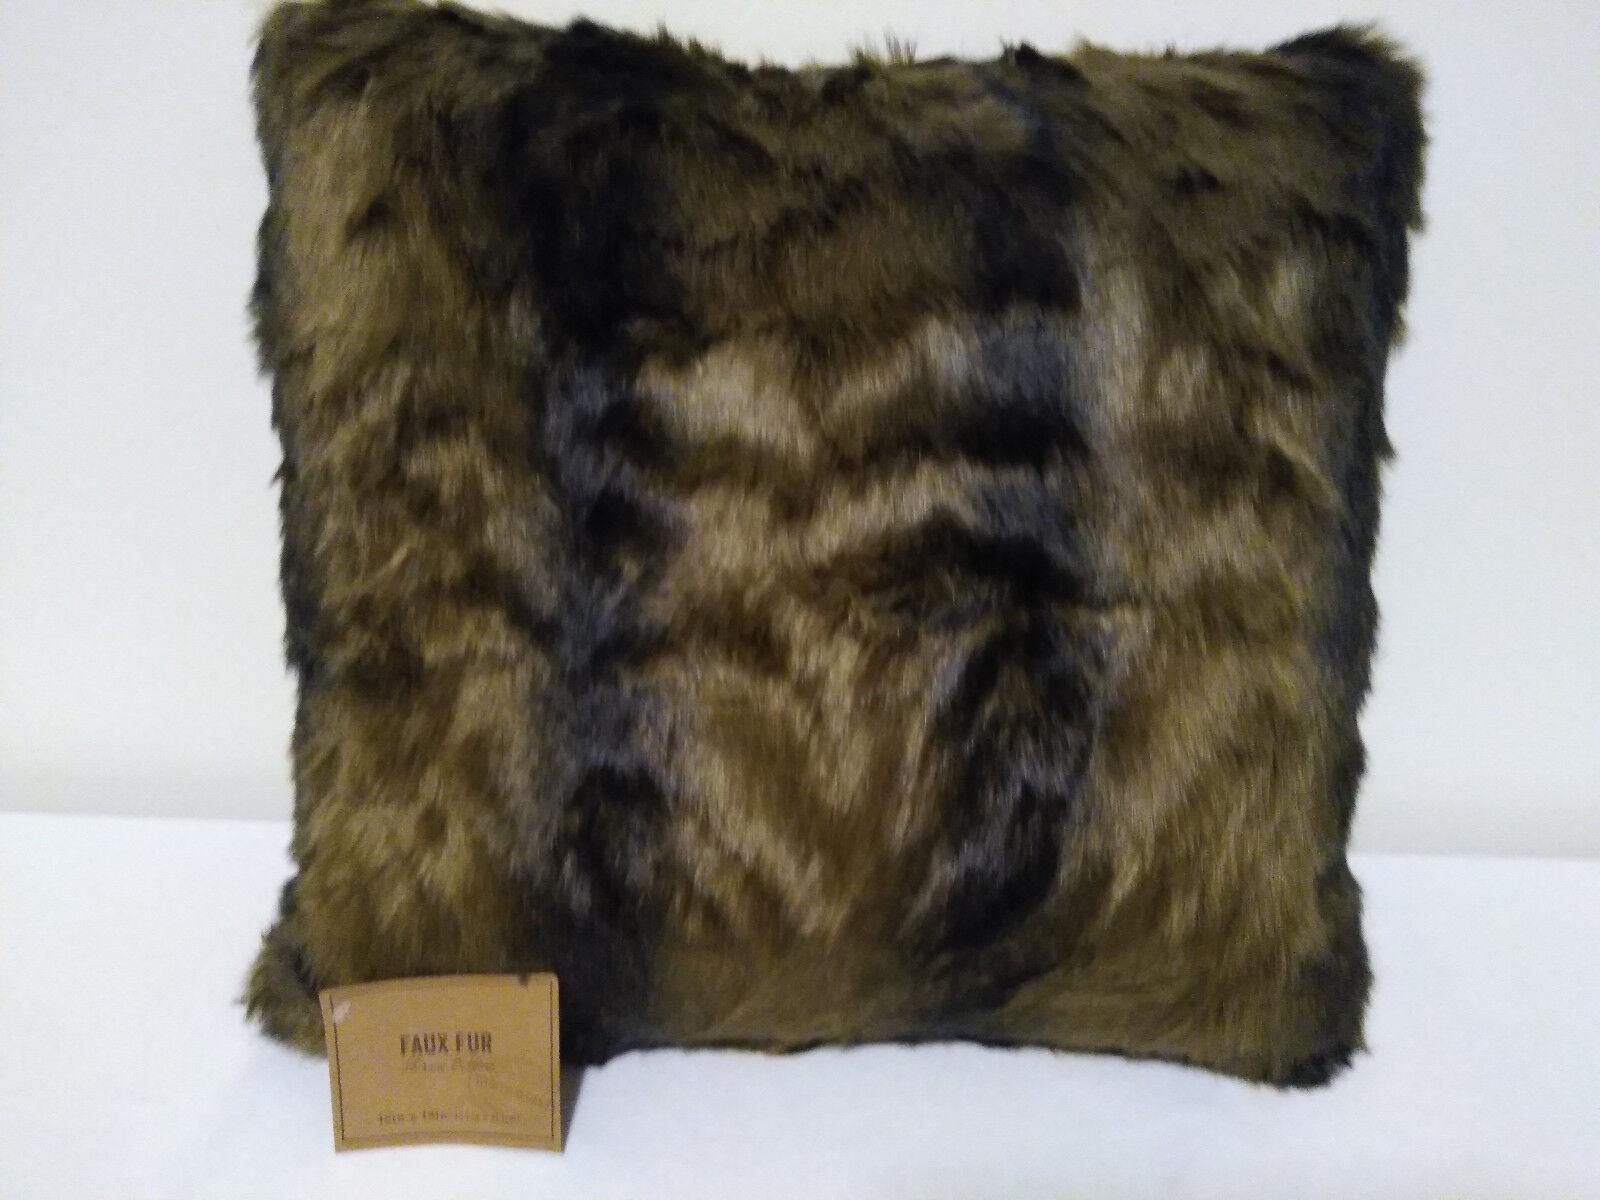 Oversized Blush Mongolian Faux Fur Lumbar Pillow Pink By World Market For Sale Online Ebay